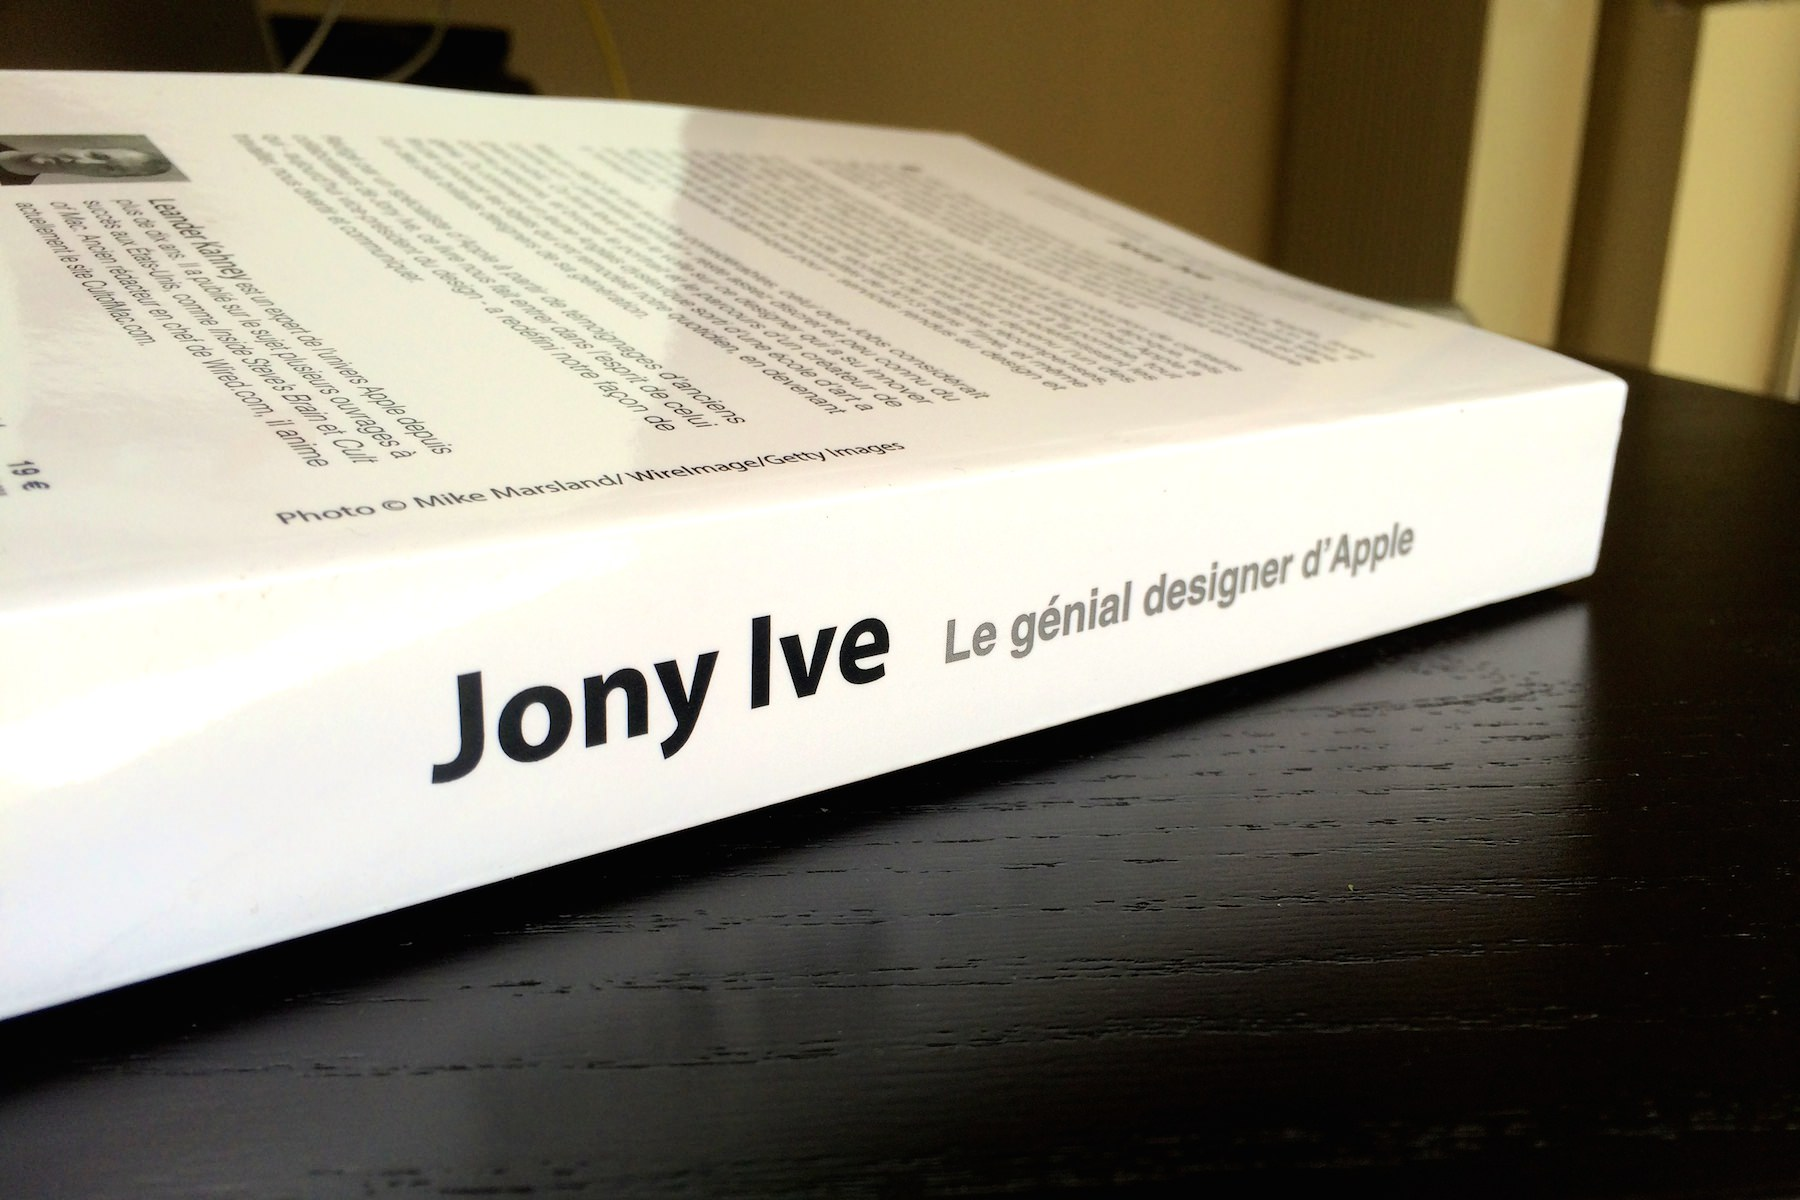 Leander kahney jony ive genial designer apple